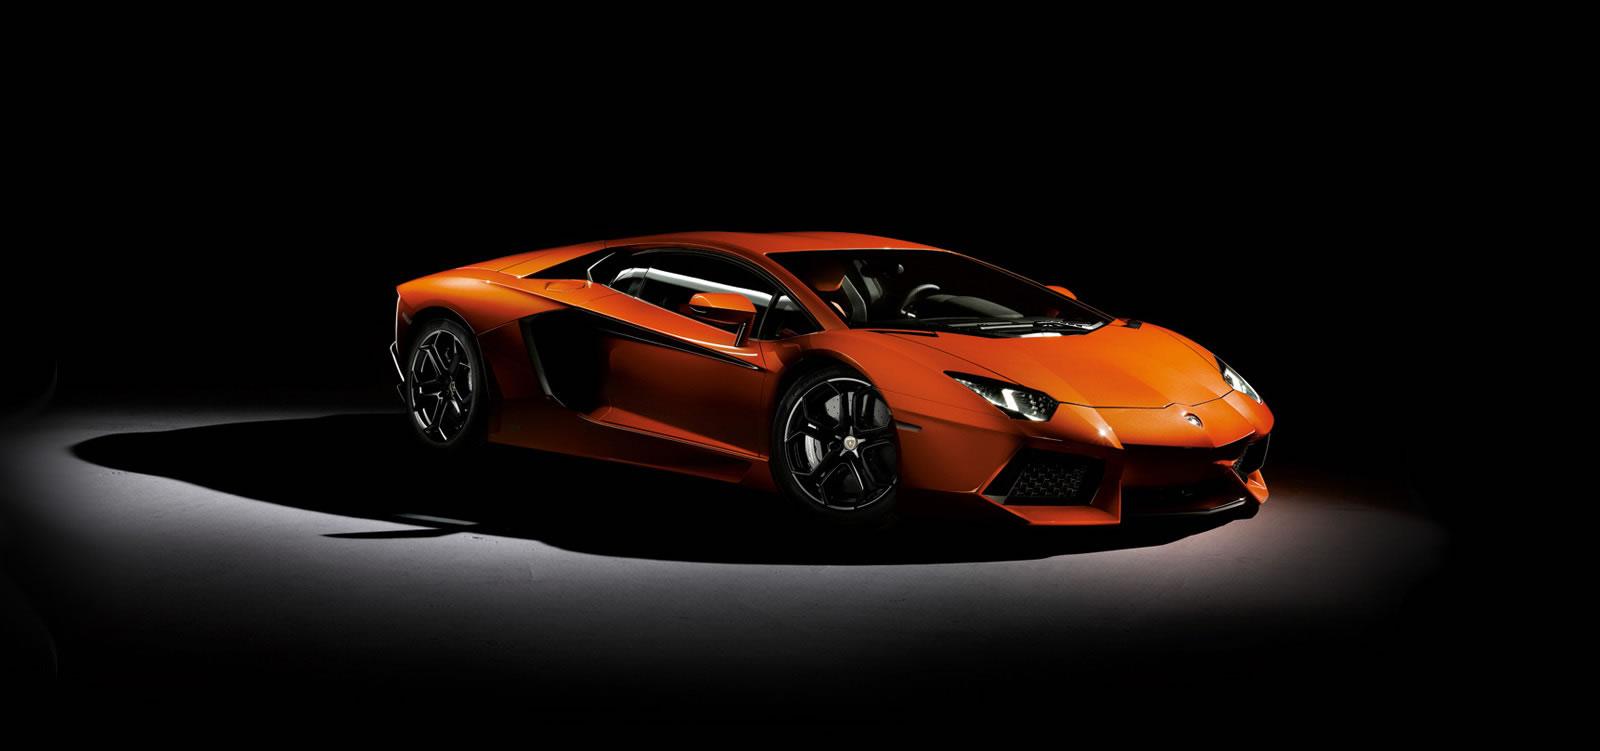 2012 Lamborghini Aventador LP7004 Review